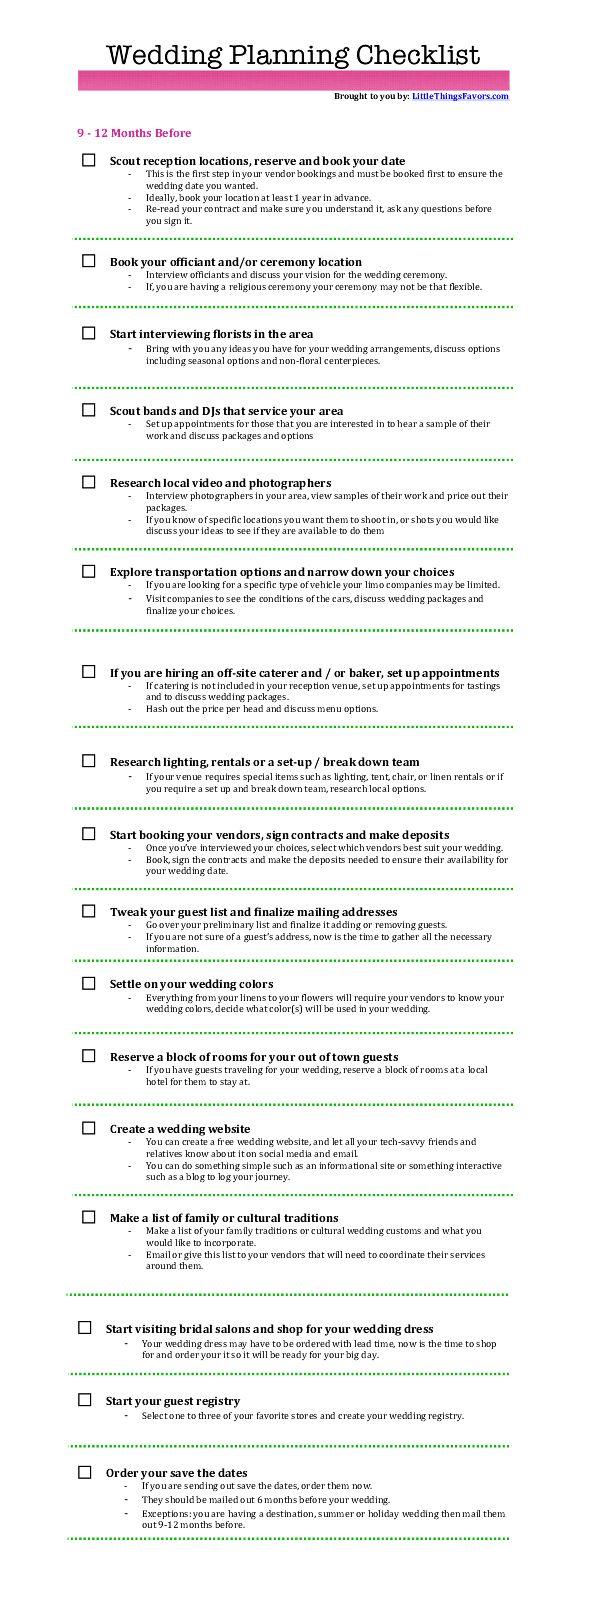 Best 25+ Wedding Checklist Printable Ideas On Pinterest | Wedding Planning  Checklist, Wedding Planning List And Diy Wedding Checklist